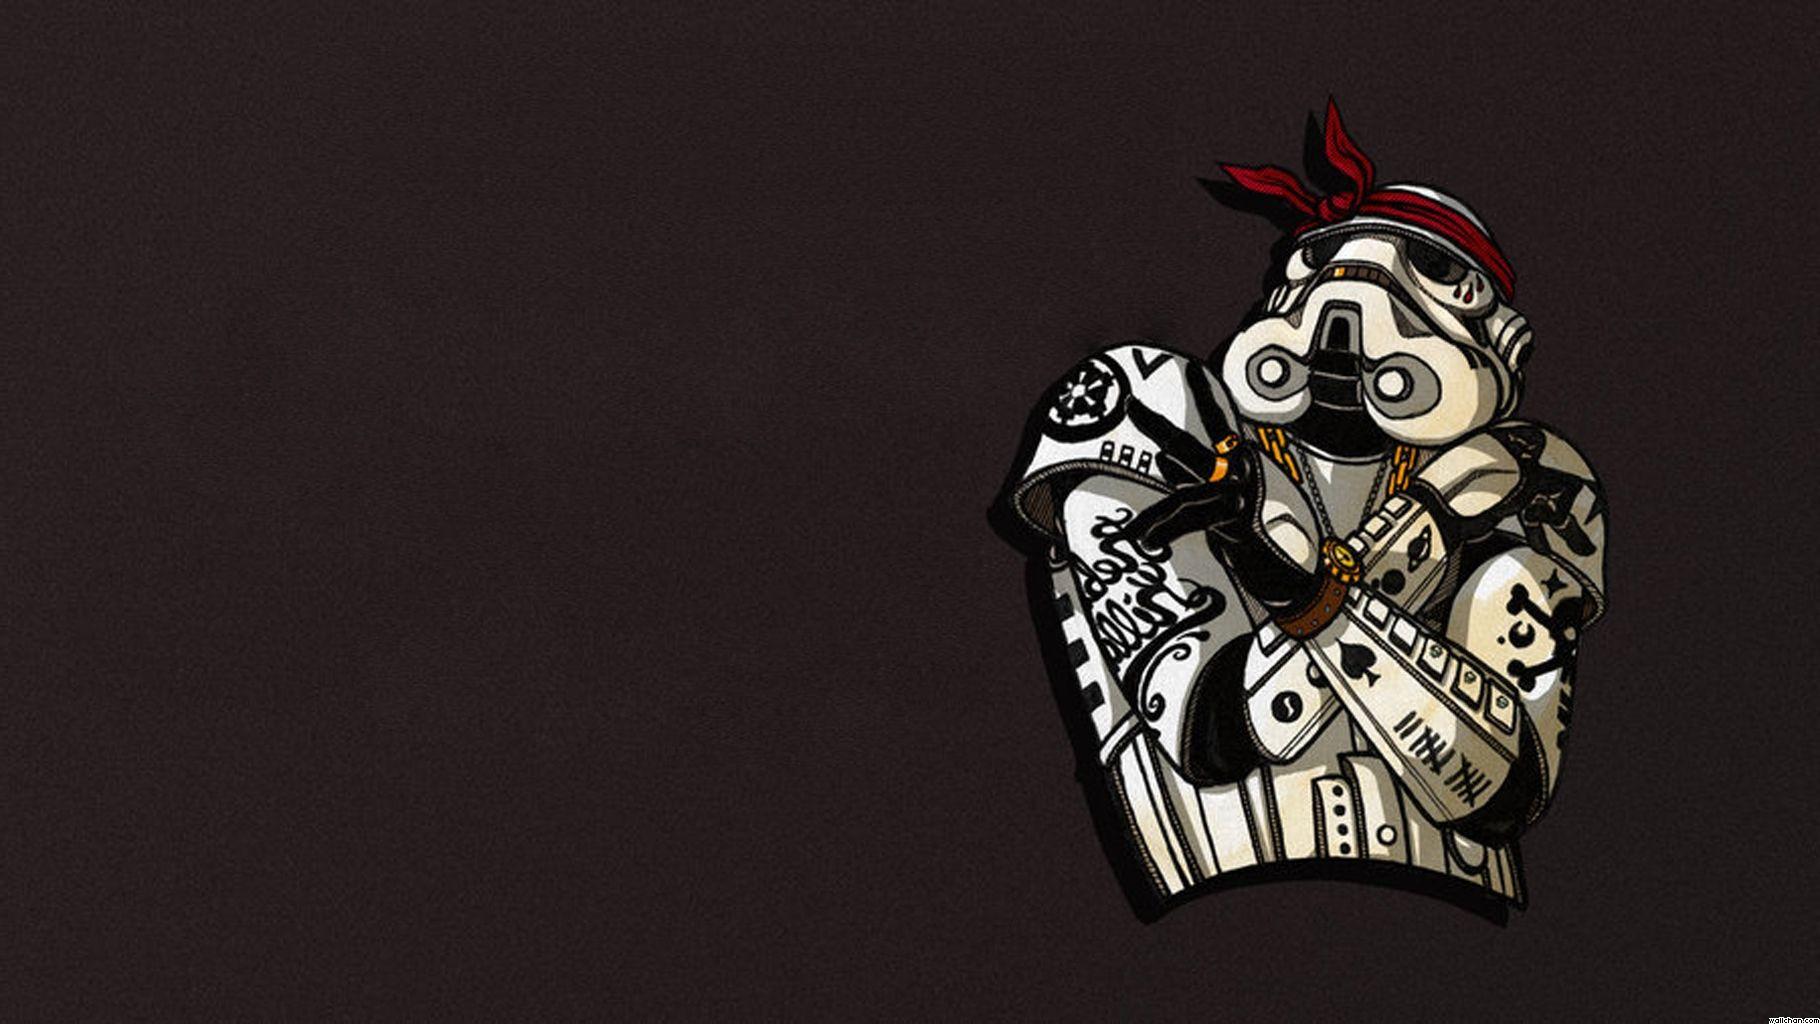 Stormtrooper Gangster Star wars wallpaper, Cool